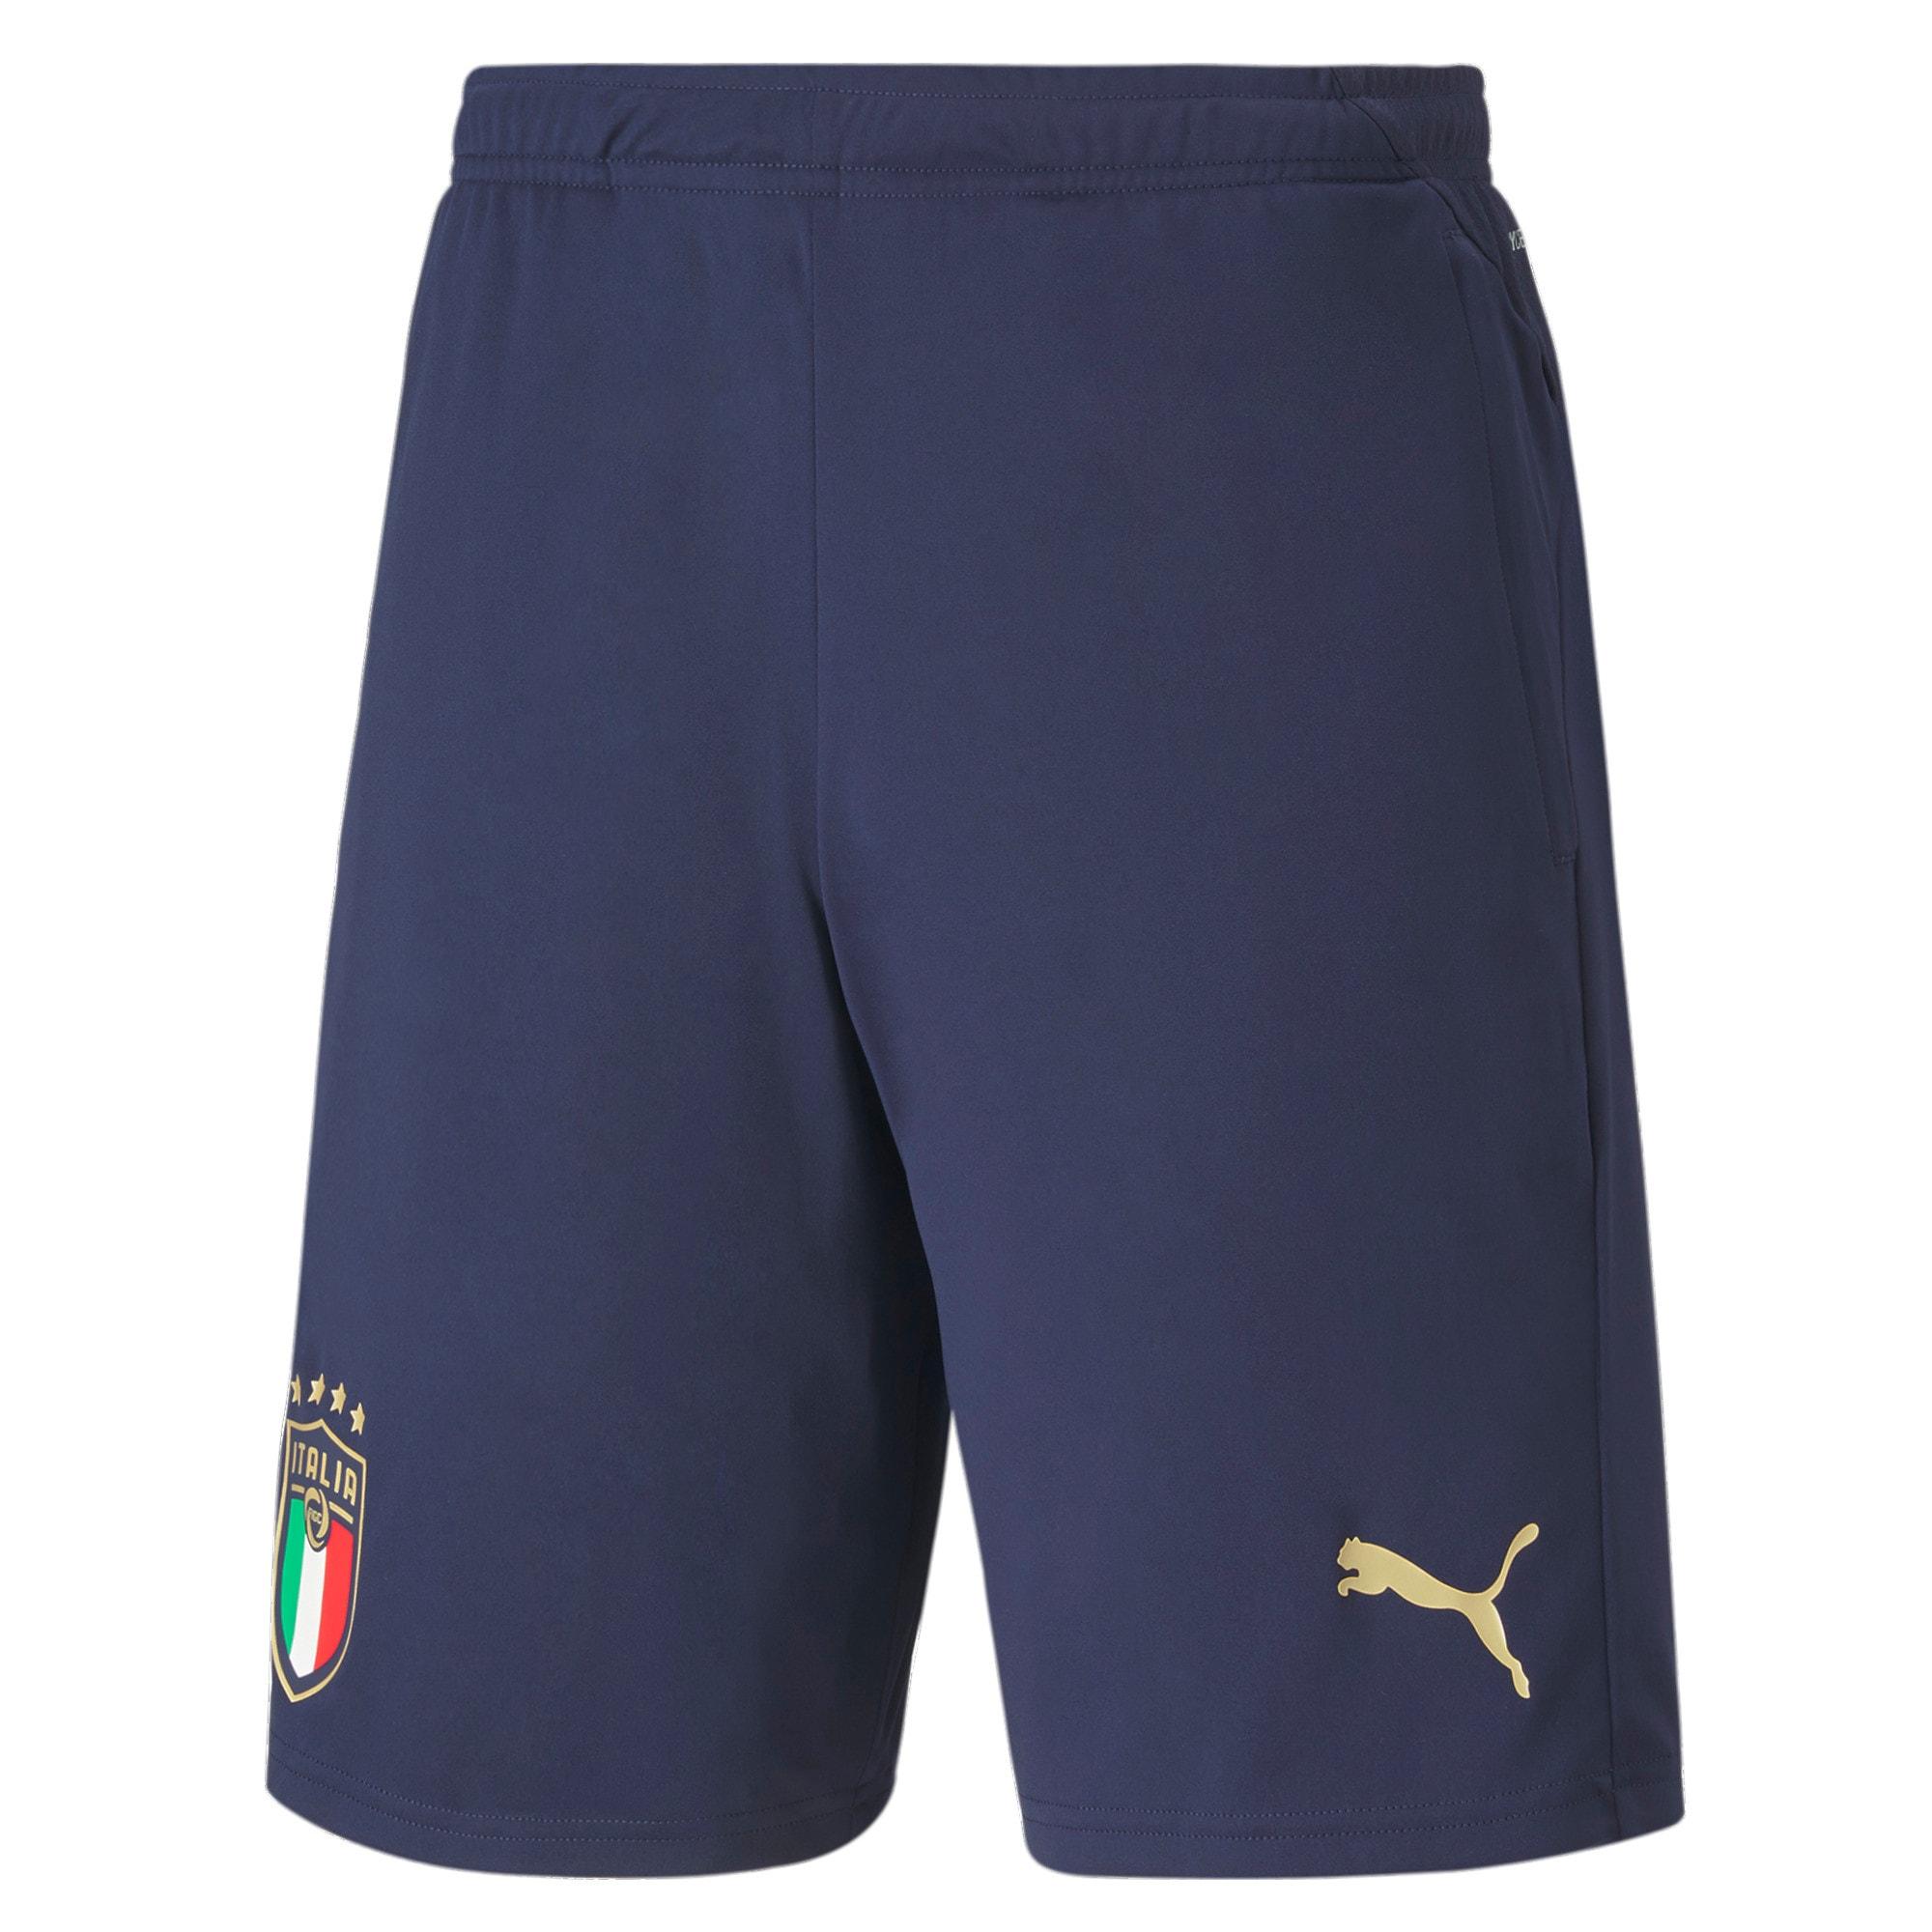 Thumbnail 1 of FIGC イタリア トレーニング ショーツ, Peacoat-Puma Team Gold, medium-JPN